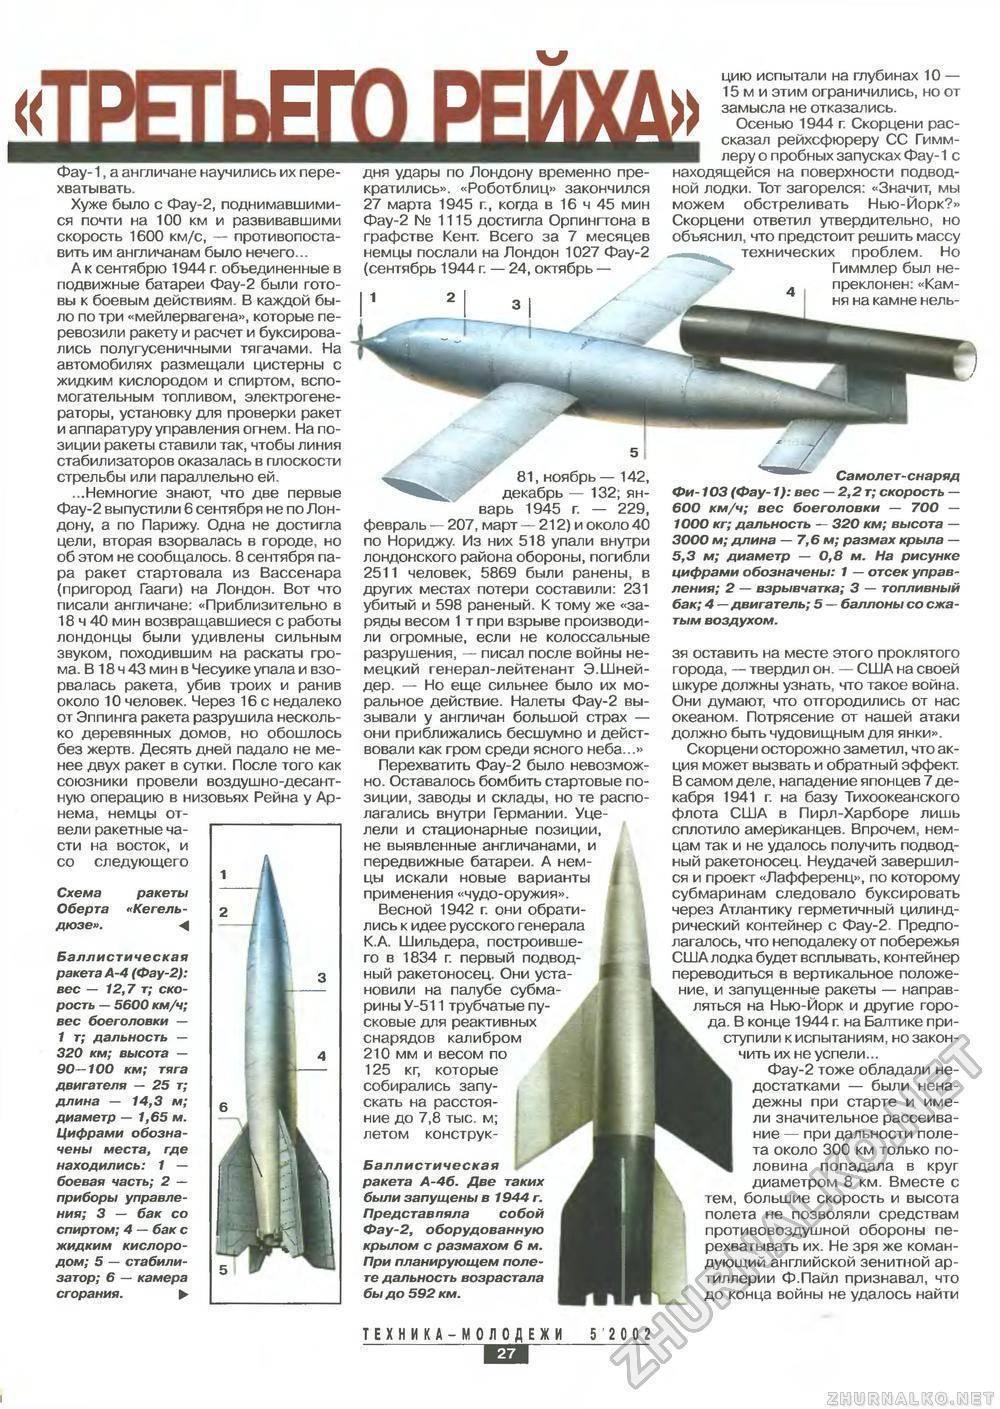 Пуски ракет фау-2